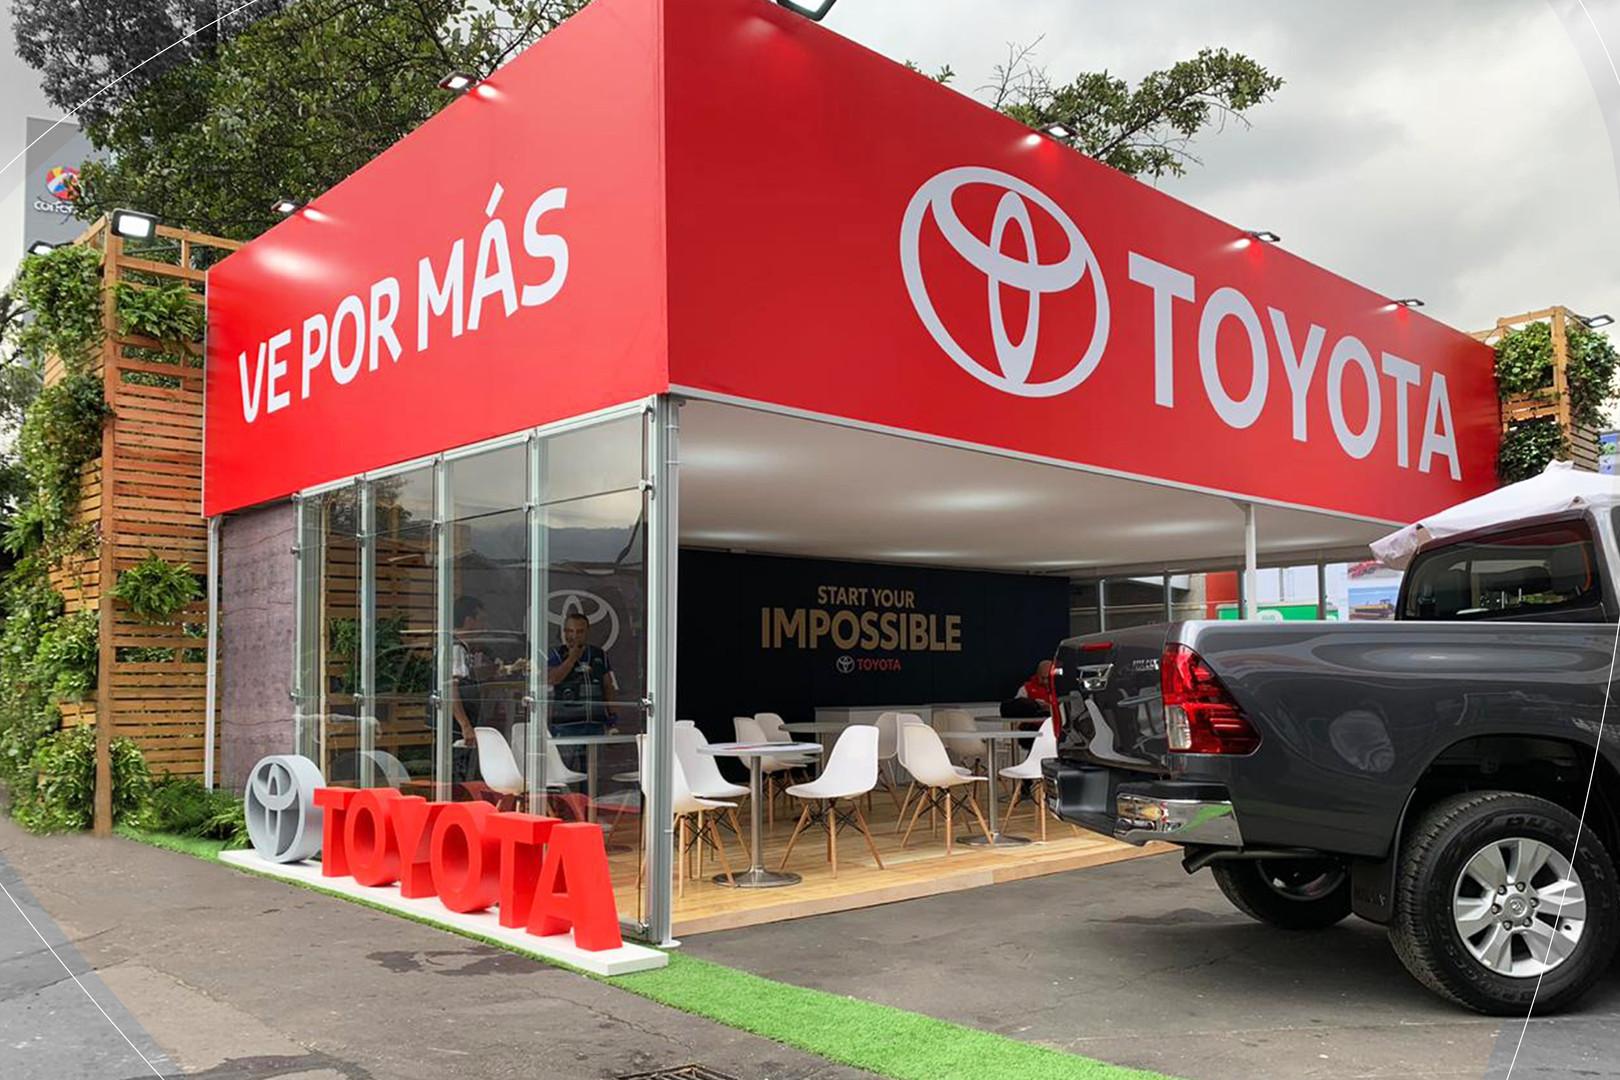 Toyota PHOTO-2019-07-11-17-08-57.jpg